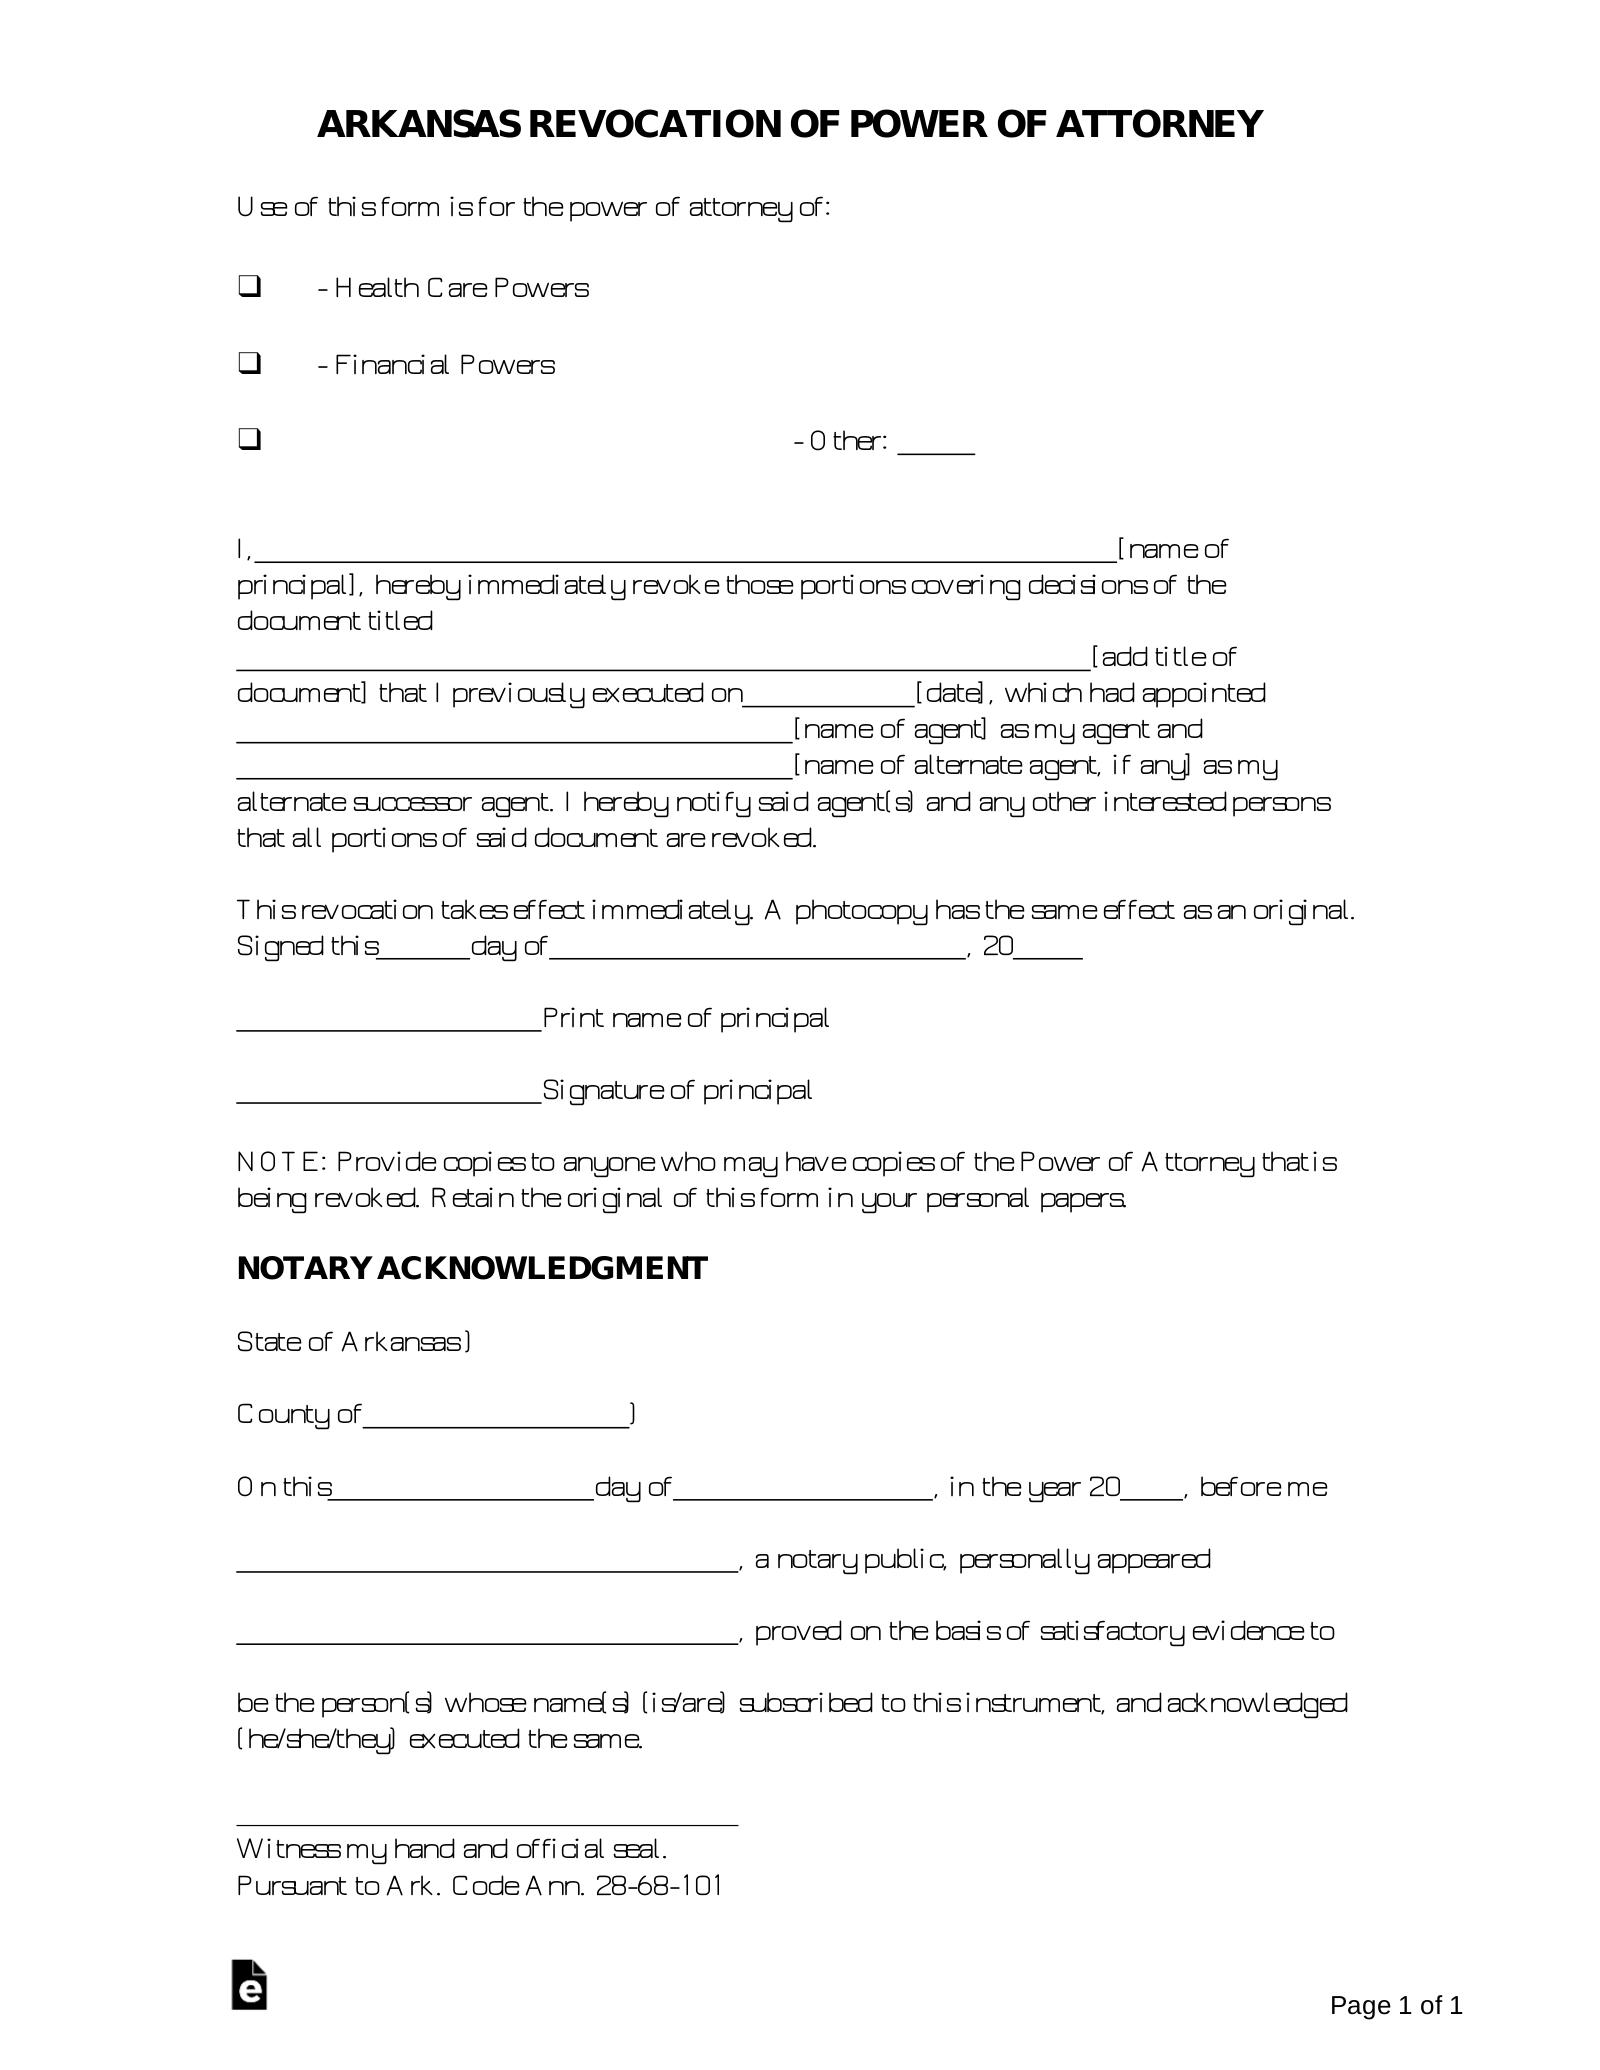 power of attorney resignation form  Free Arkansas Revocation of Power of Attorney Form - PDF ...